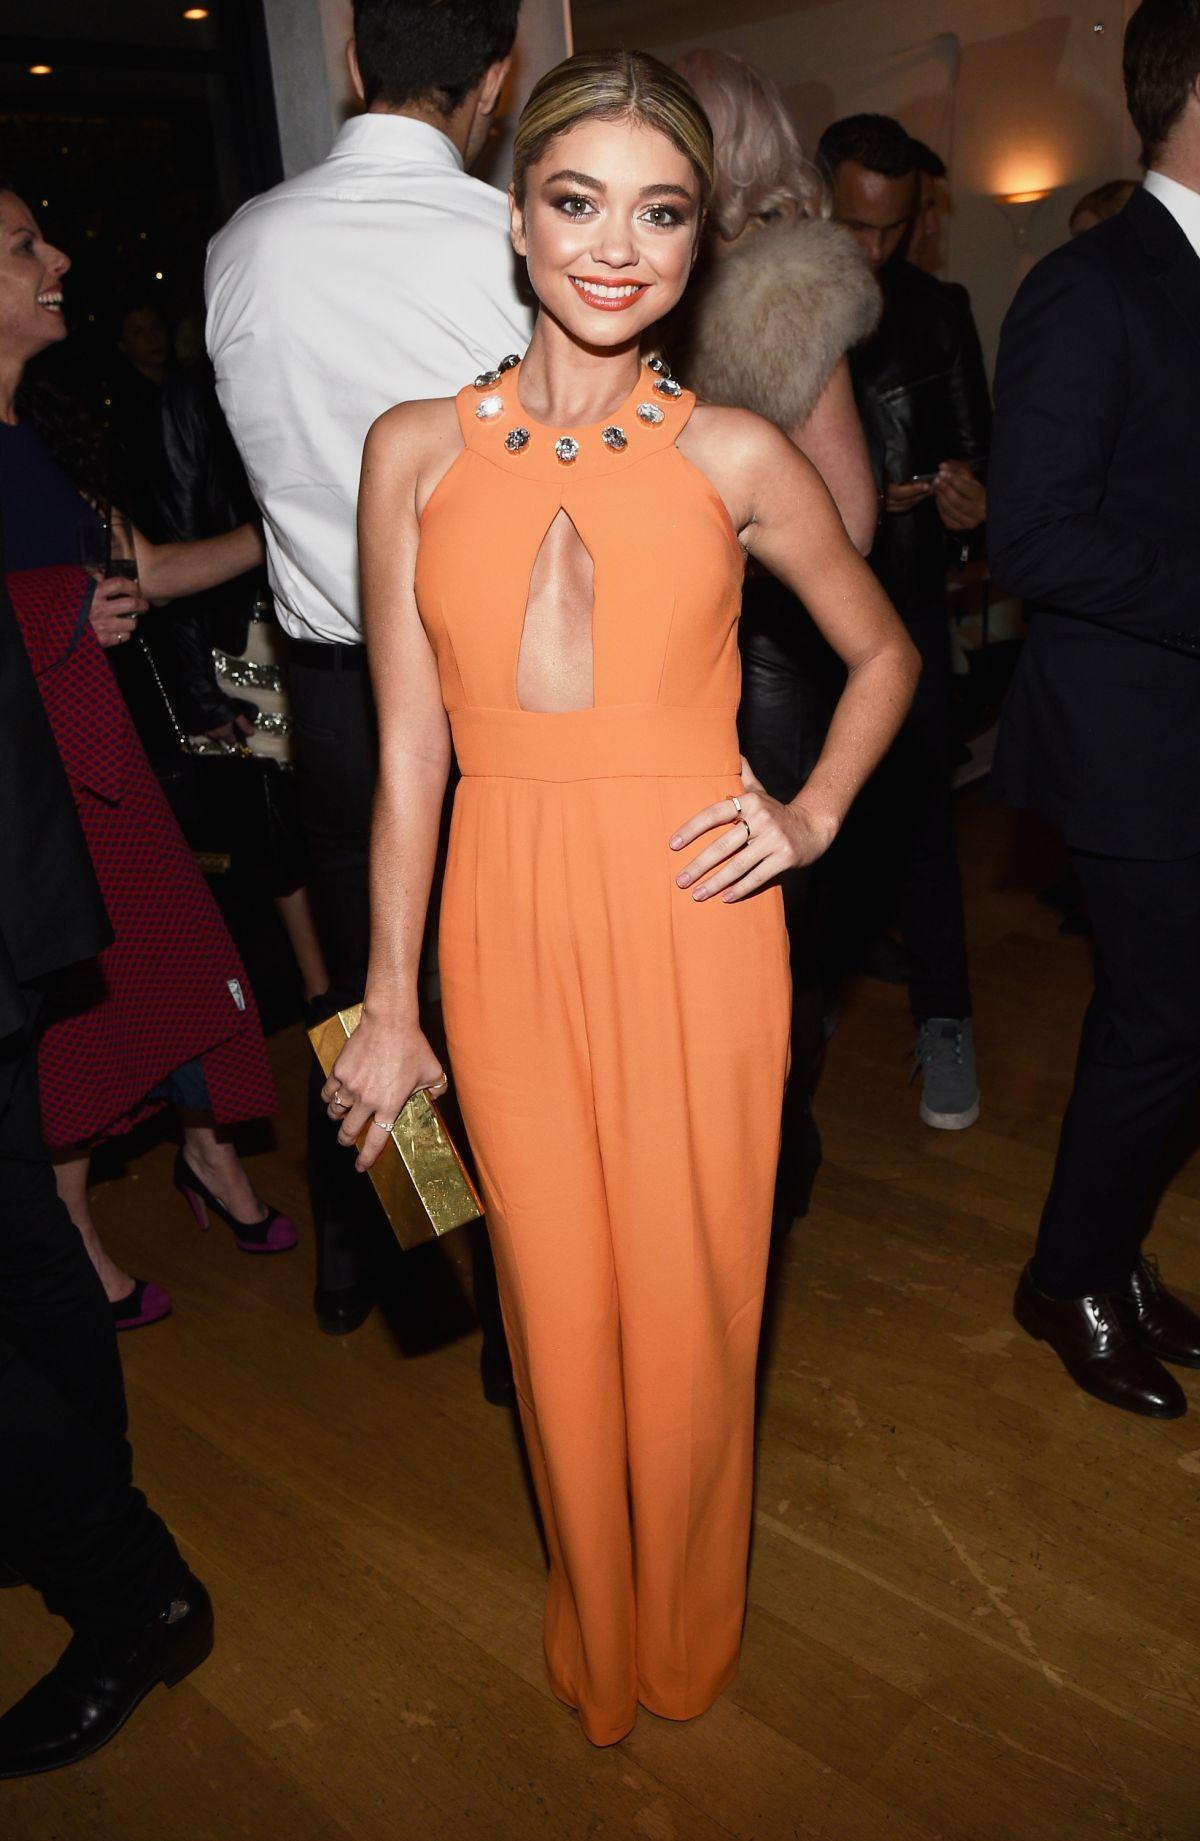 SARAH HYLAND at Hfpa abd Instyle Celebrate 2015 Golden Globe Award Season in Hollywood